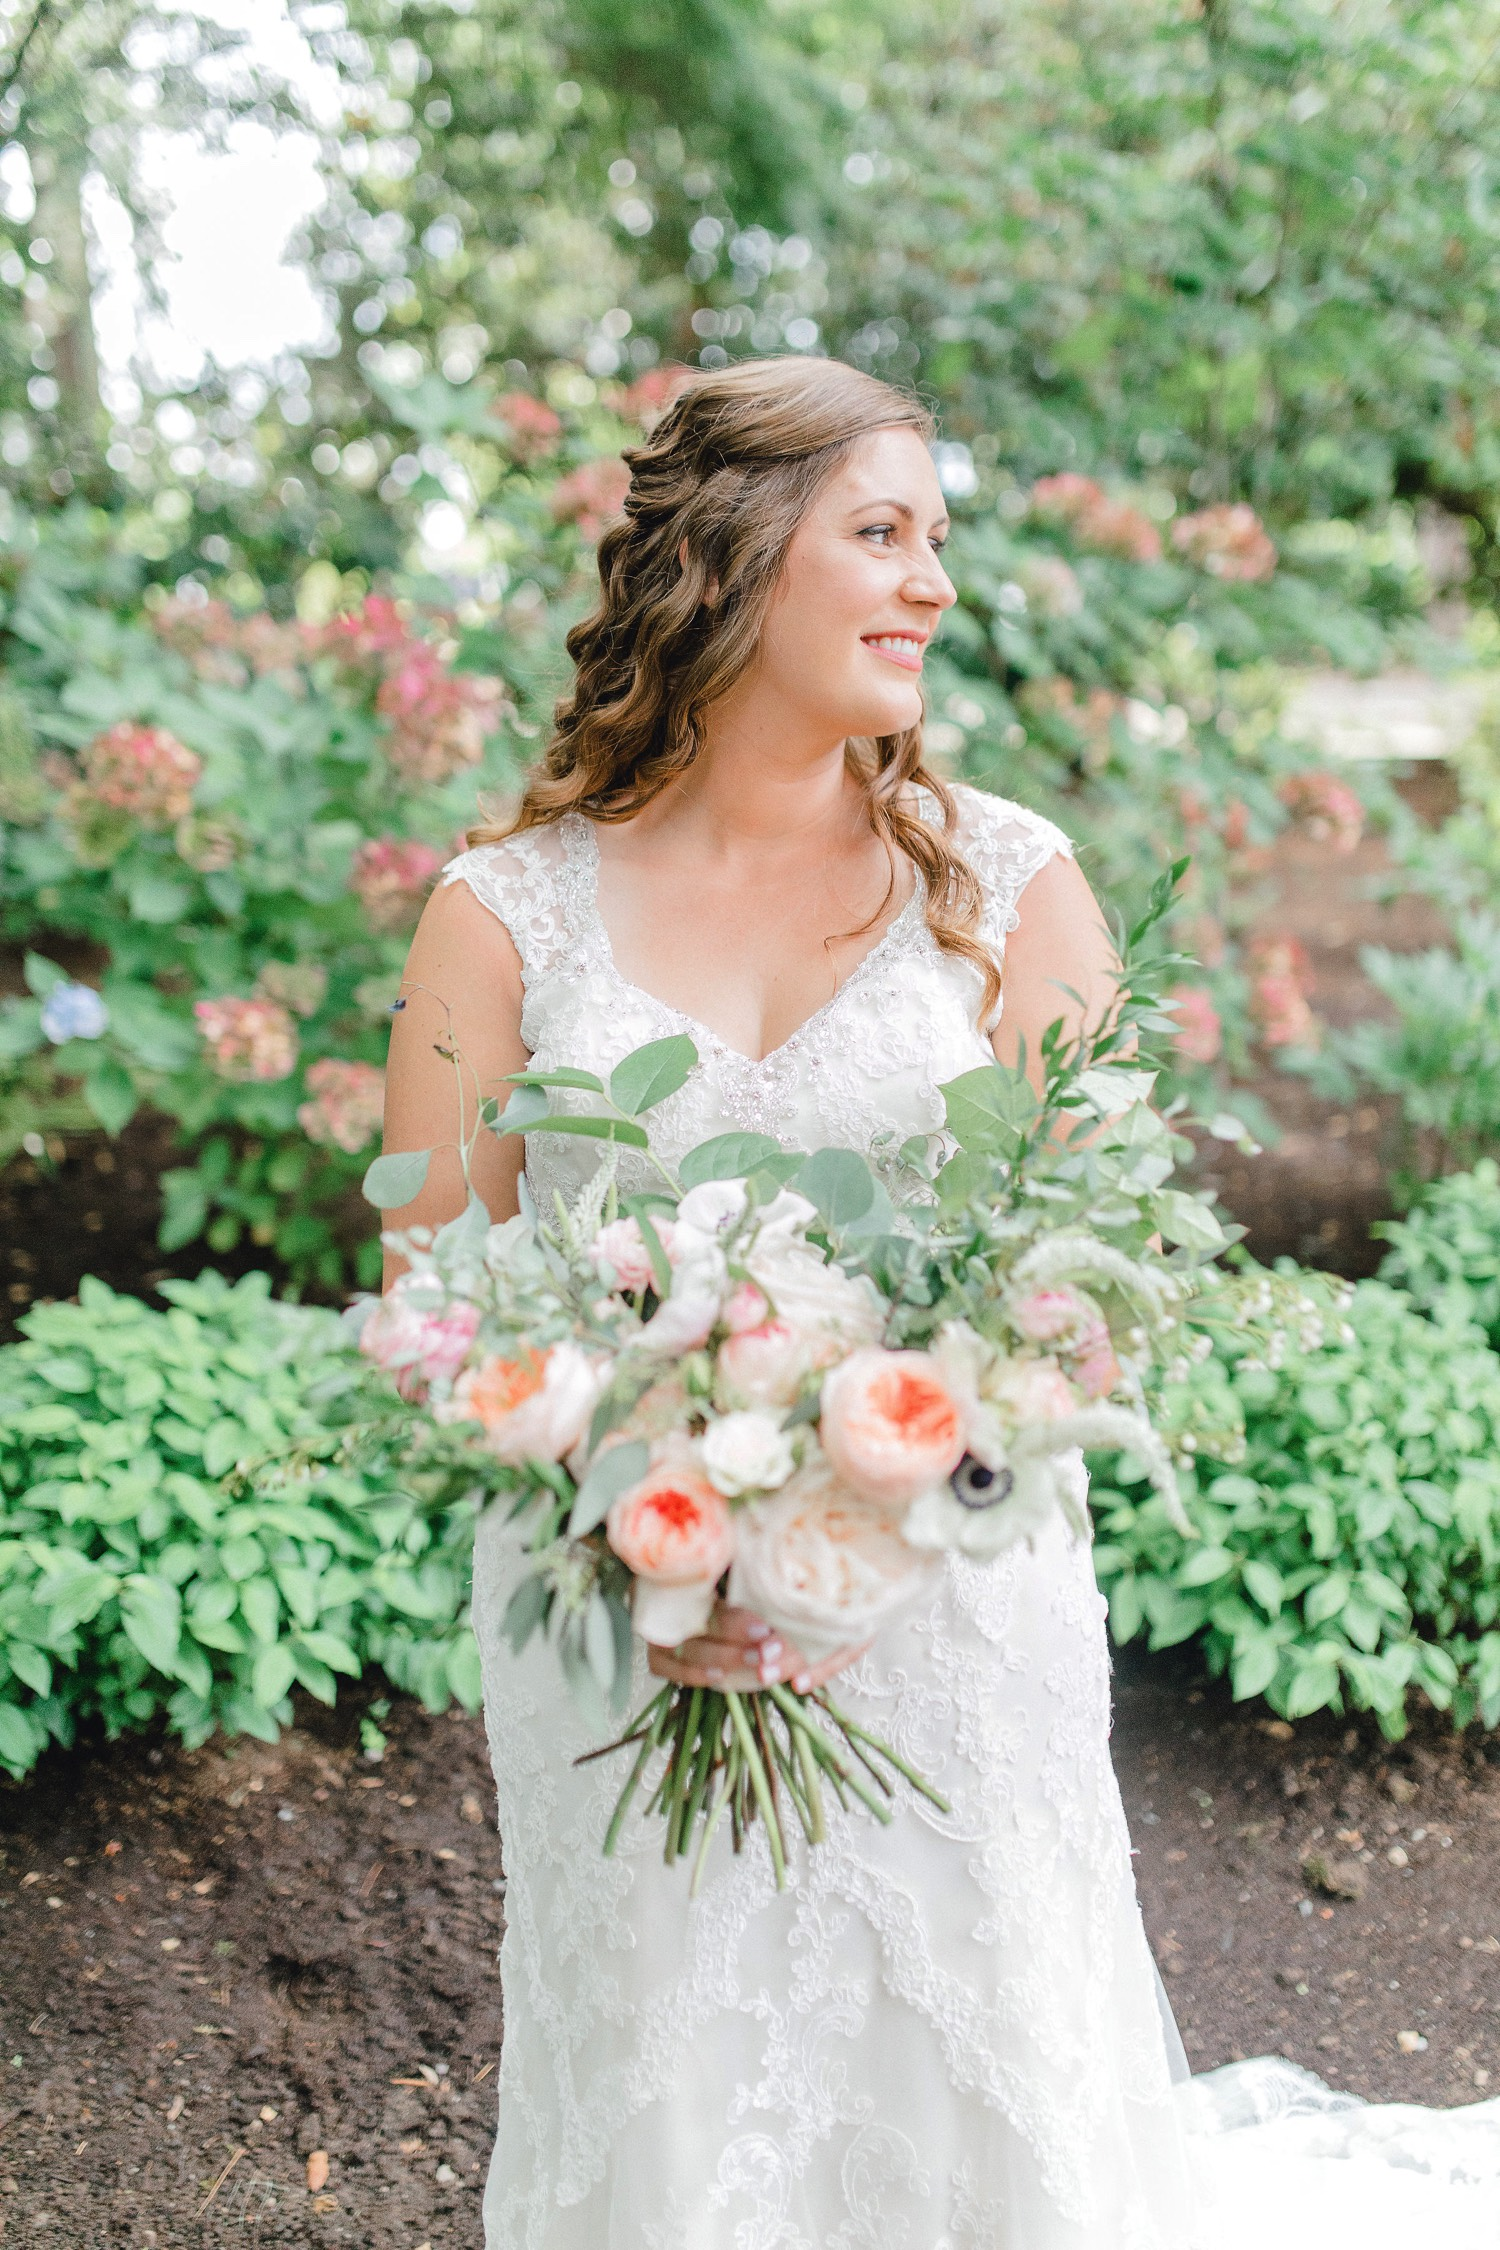 0000000000032_emmarosecompany_katiematt-3117_Photographer_PNW_House_Robinswood_Emma_Light_Company_Airy_Rose_and_Wedding_Seattle.jpg